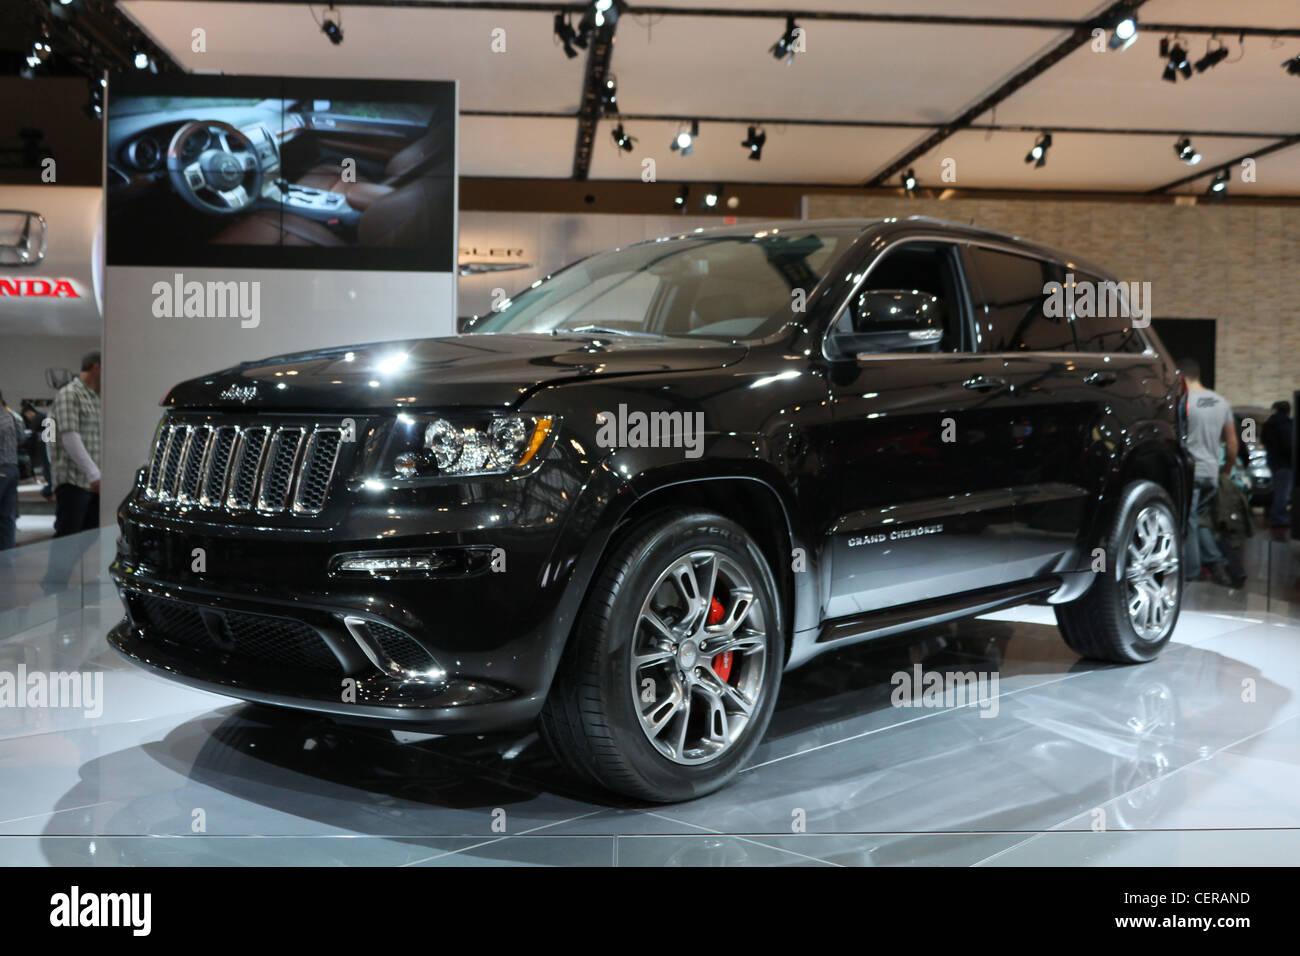 Black Jeep Suv Car Stock Photo Alamy